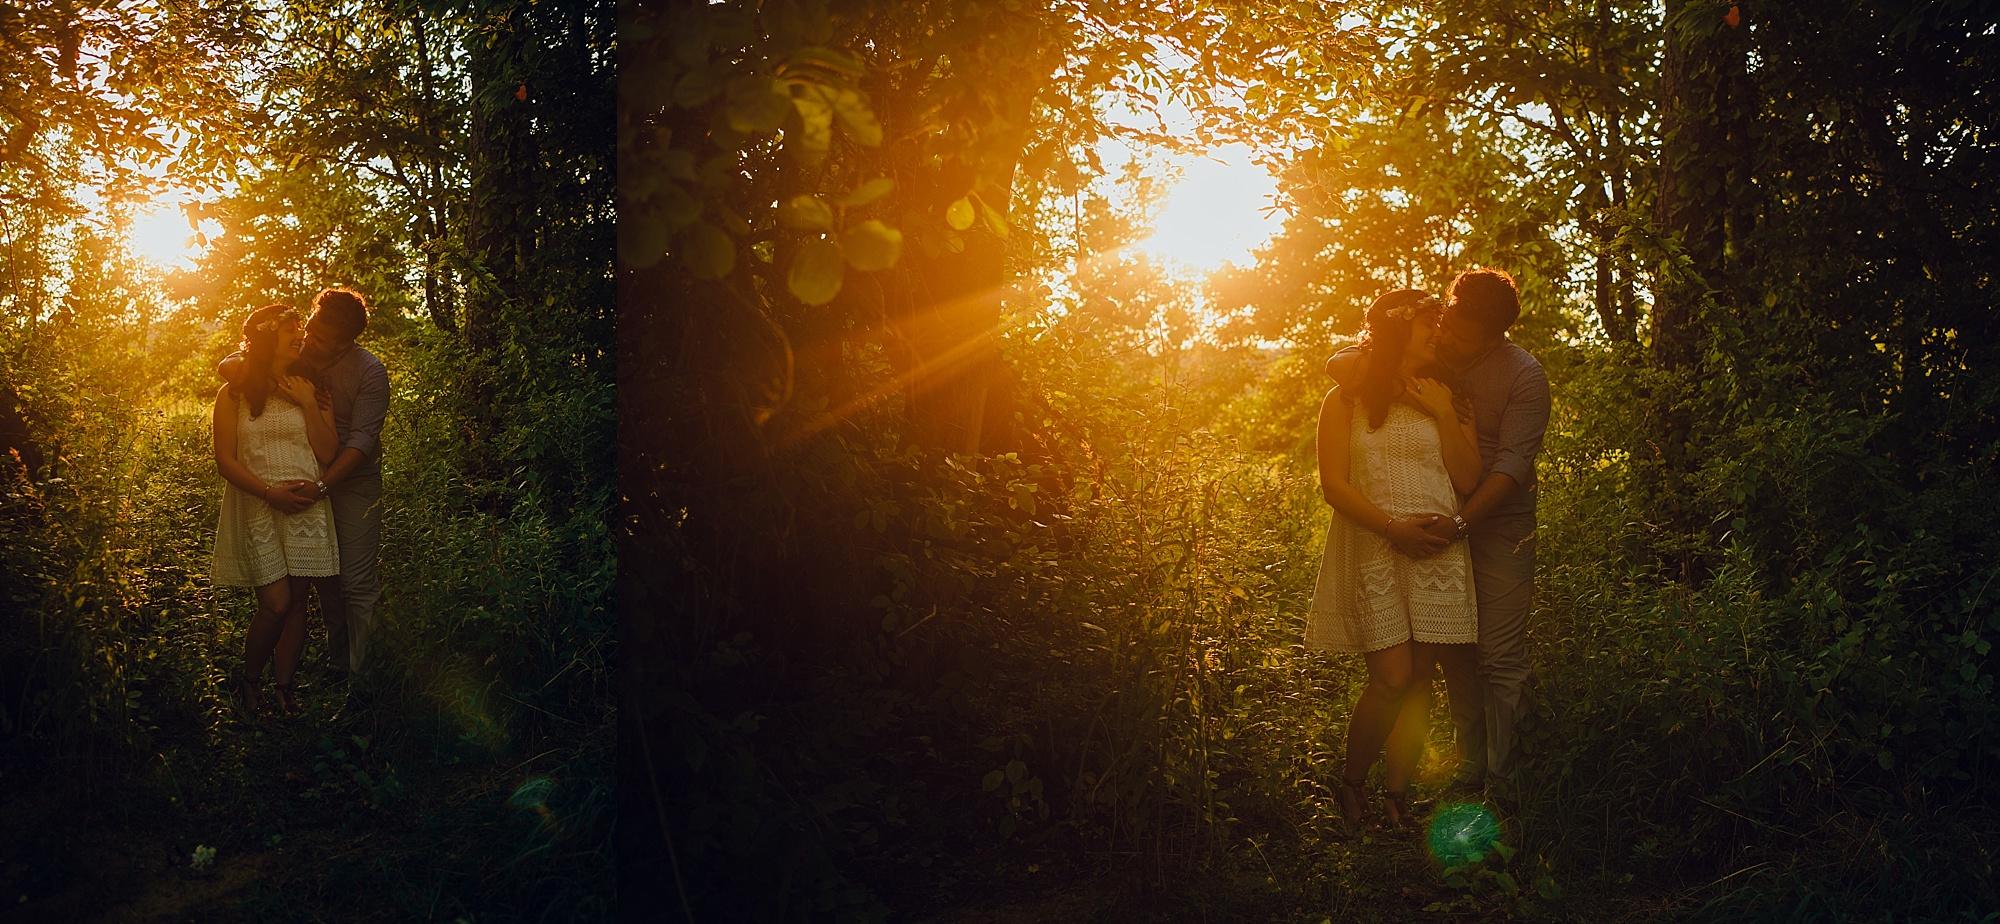 lauren-grayson-photography-cleveland-ohio-photographer-maternity-summer-outdoor-bohemian-fields-session_0499.jpg